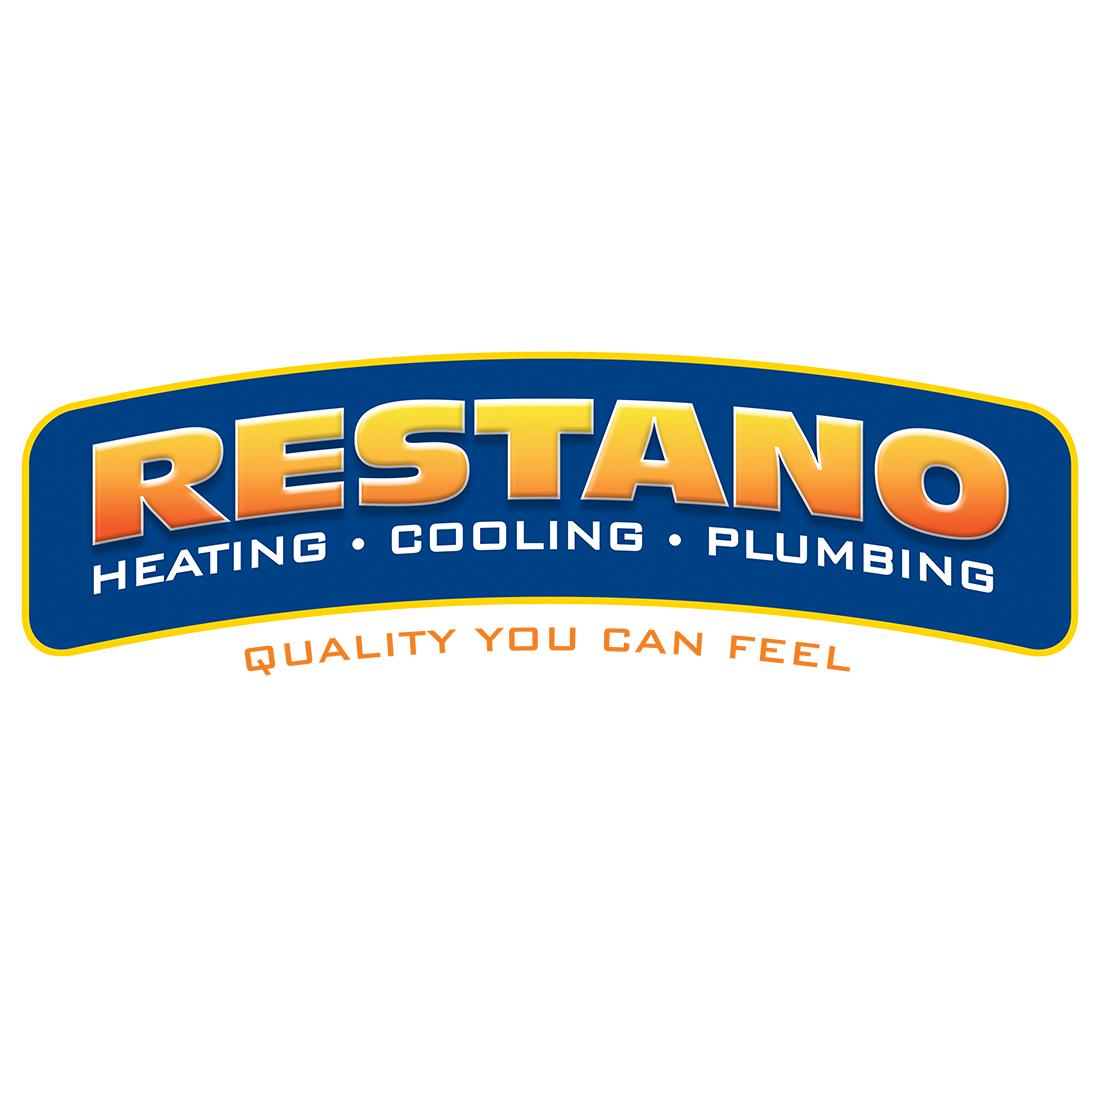 Restano Heating, Cooling & Plumbing